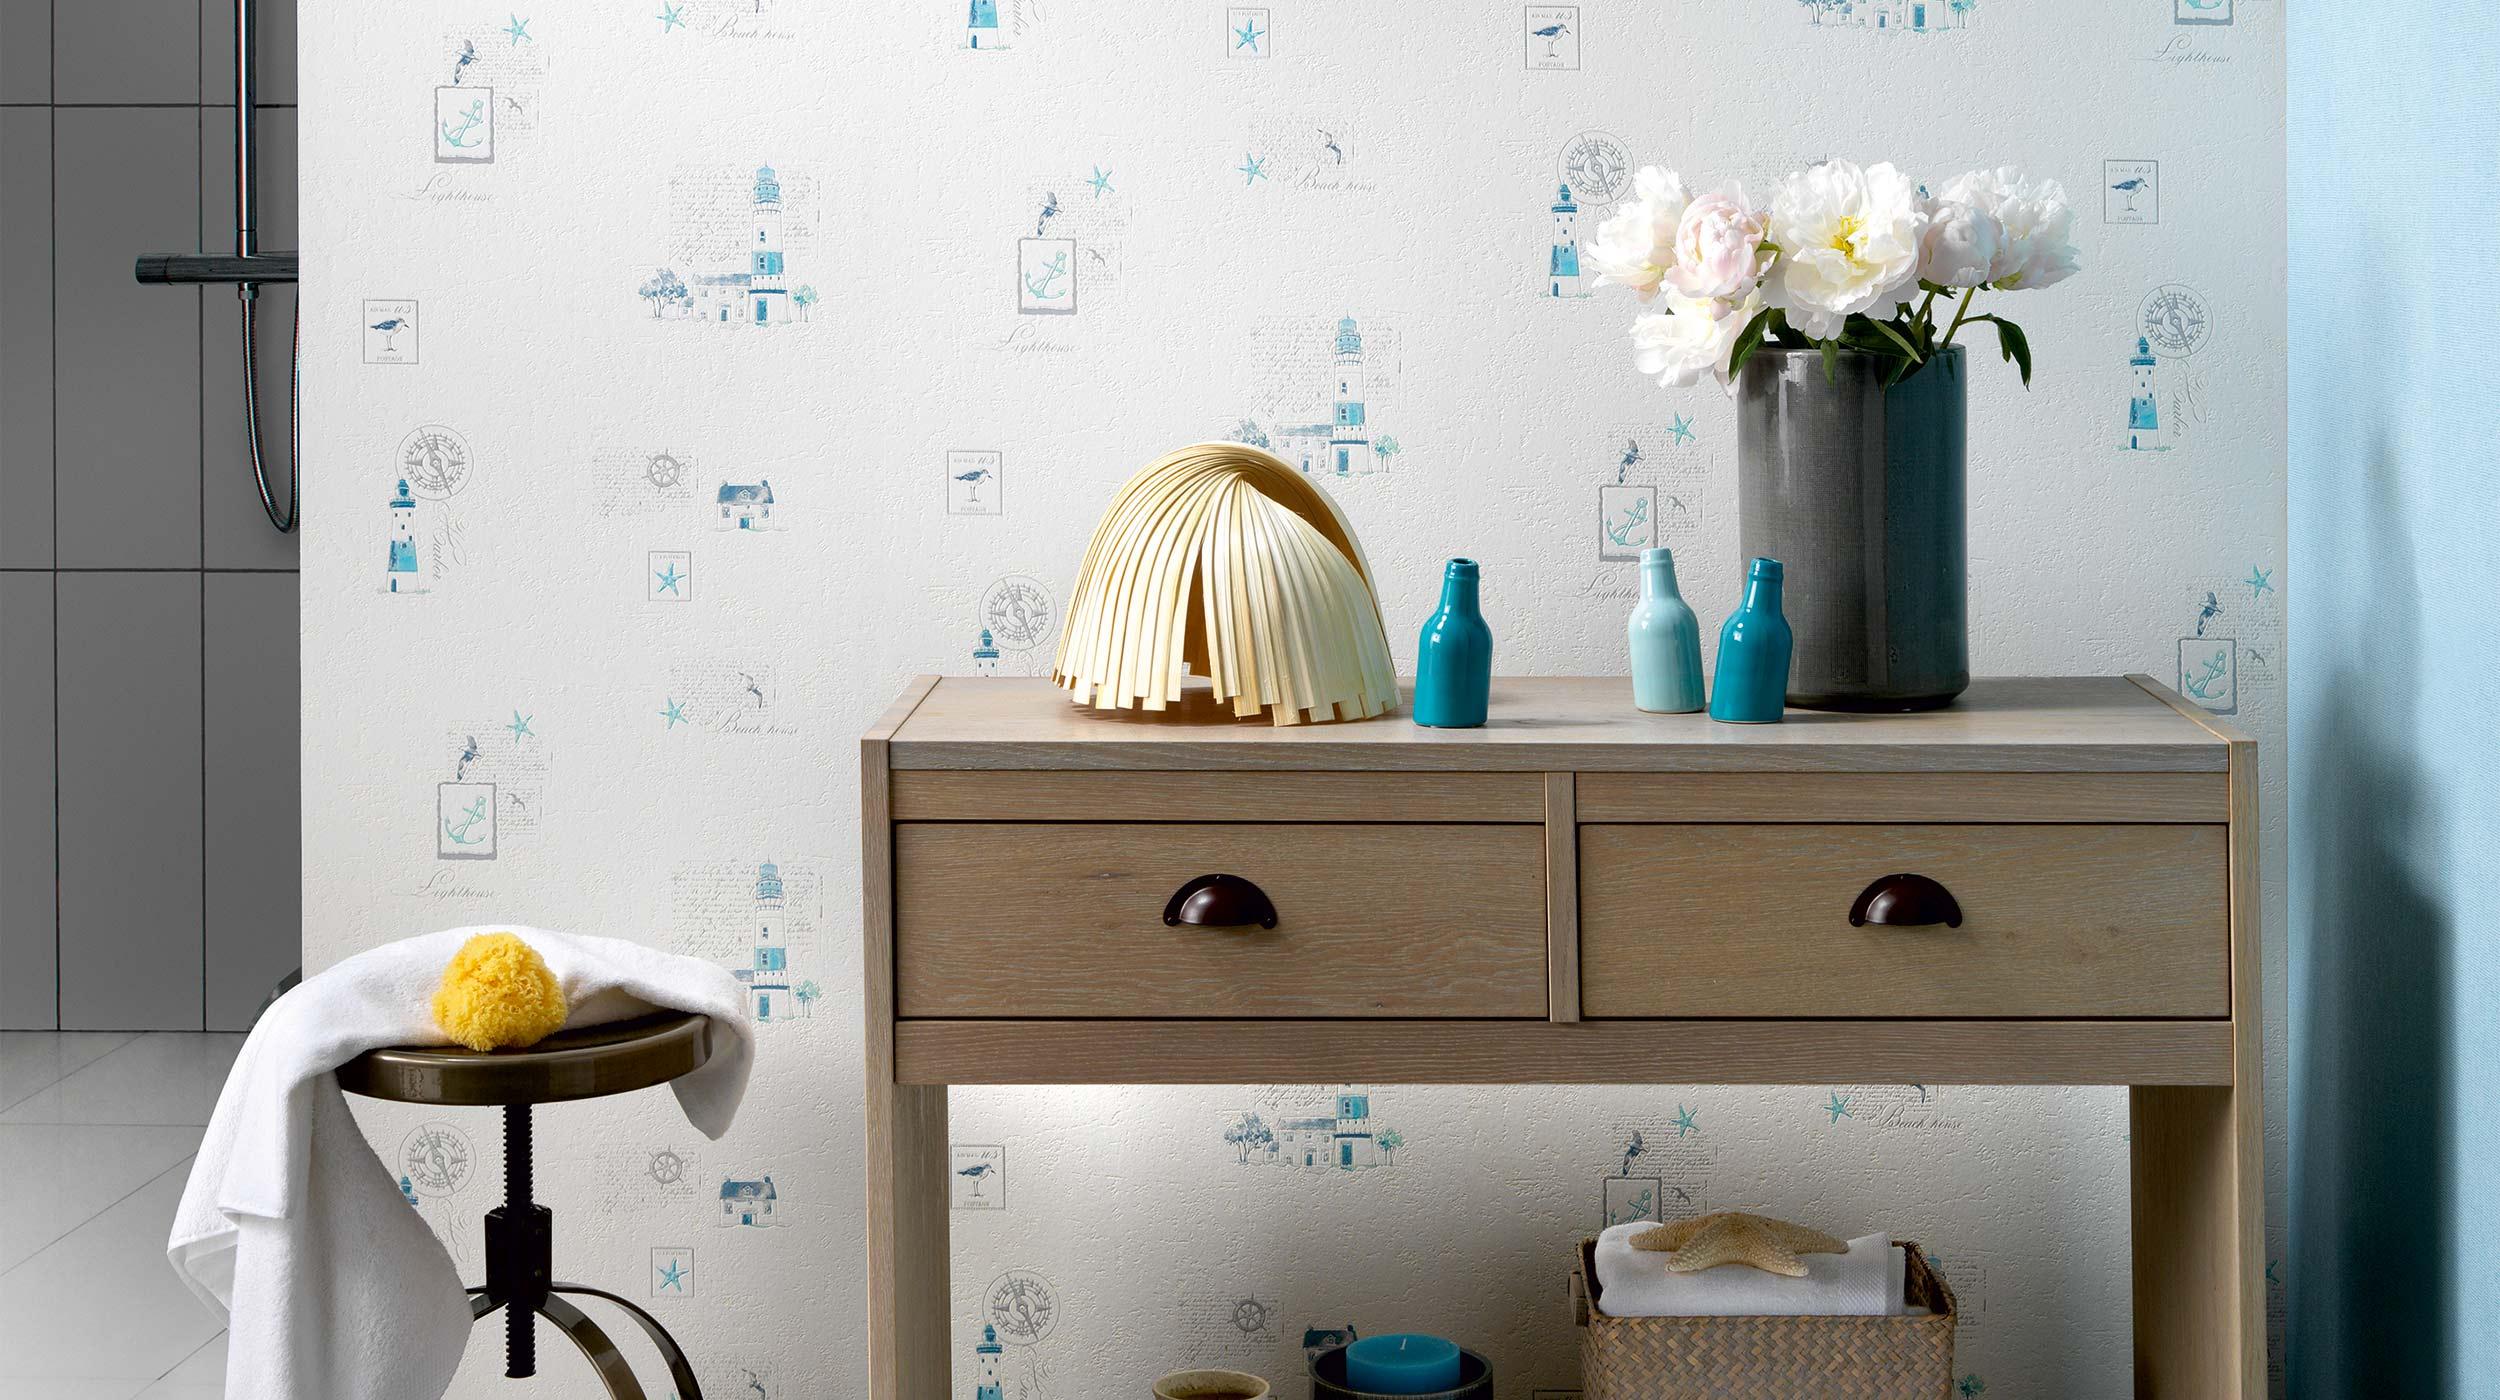 tapete im badezimmer aliexpress blasen kreis abnehmbare wand tapete badezimmer badezimmer pink. Black Bedroom Furniture Sets. Home Design Ideas